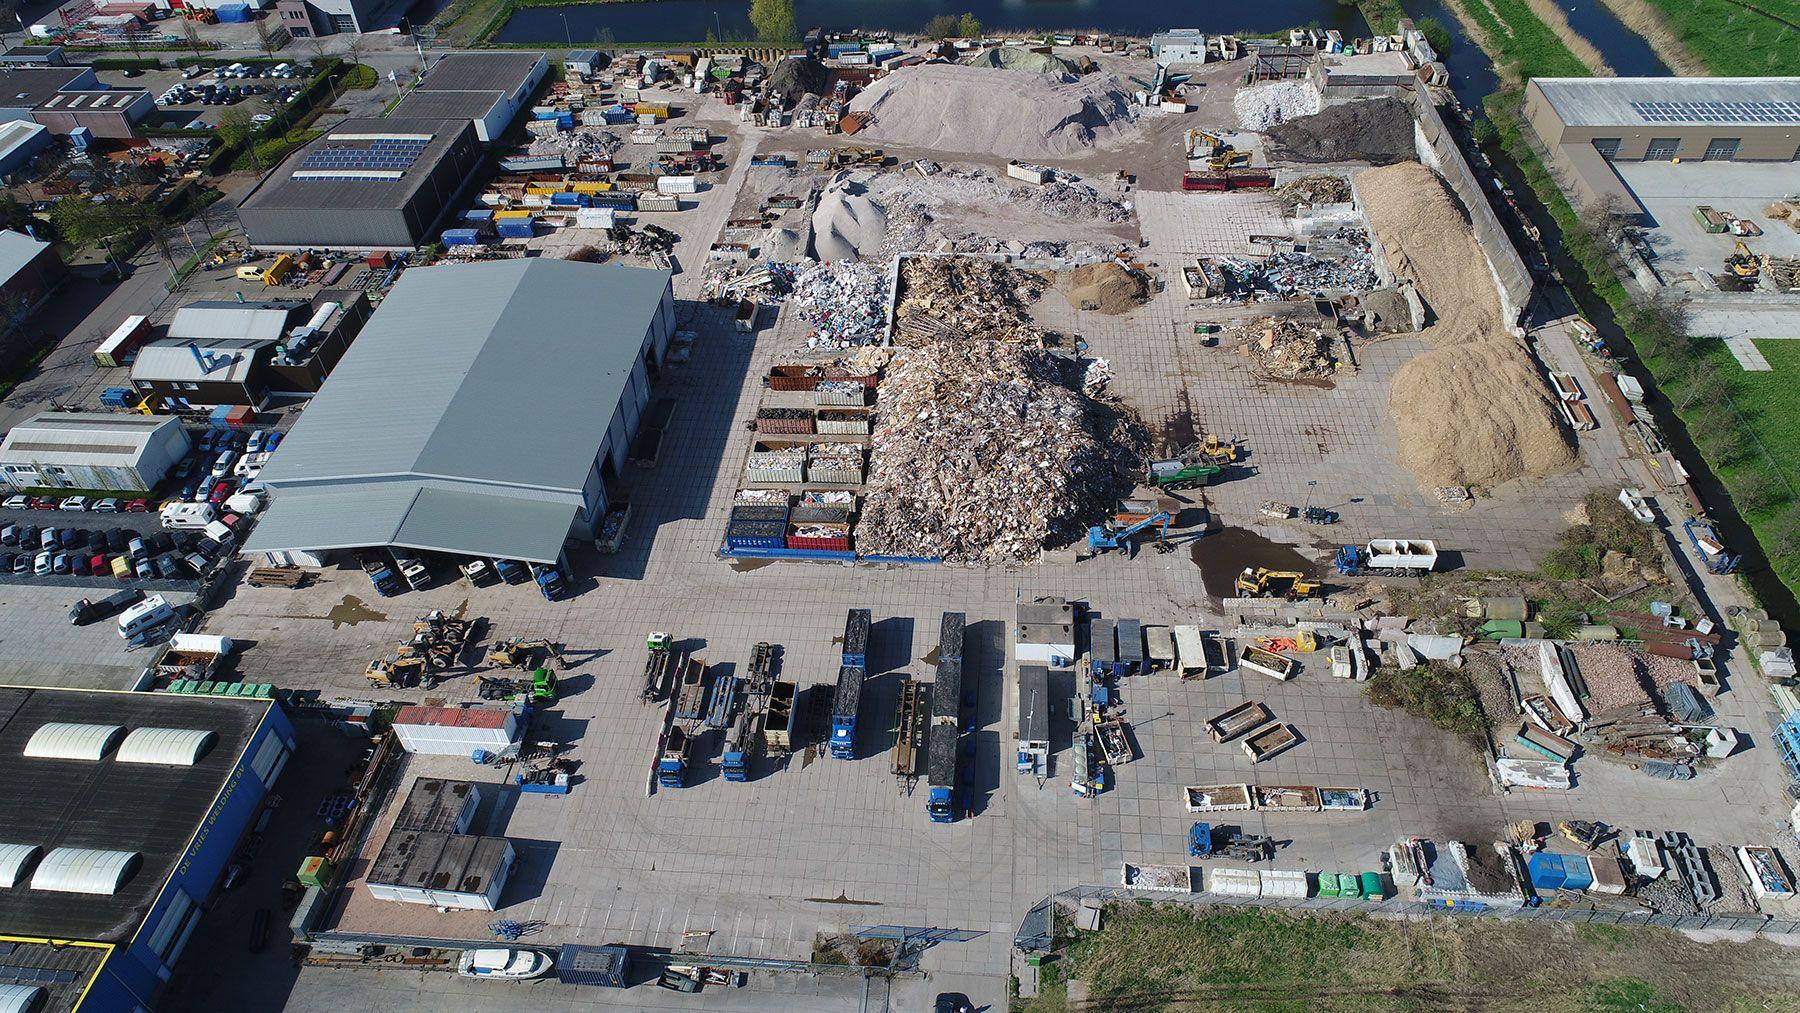 Afvalcontainers Midden Nederland Container Huren Recycling Centrale Korevaar (RCK)